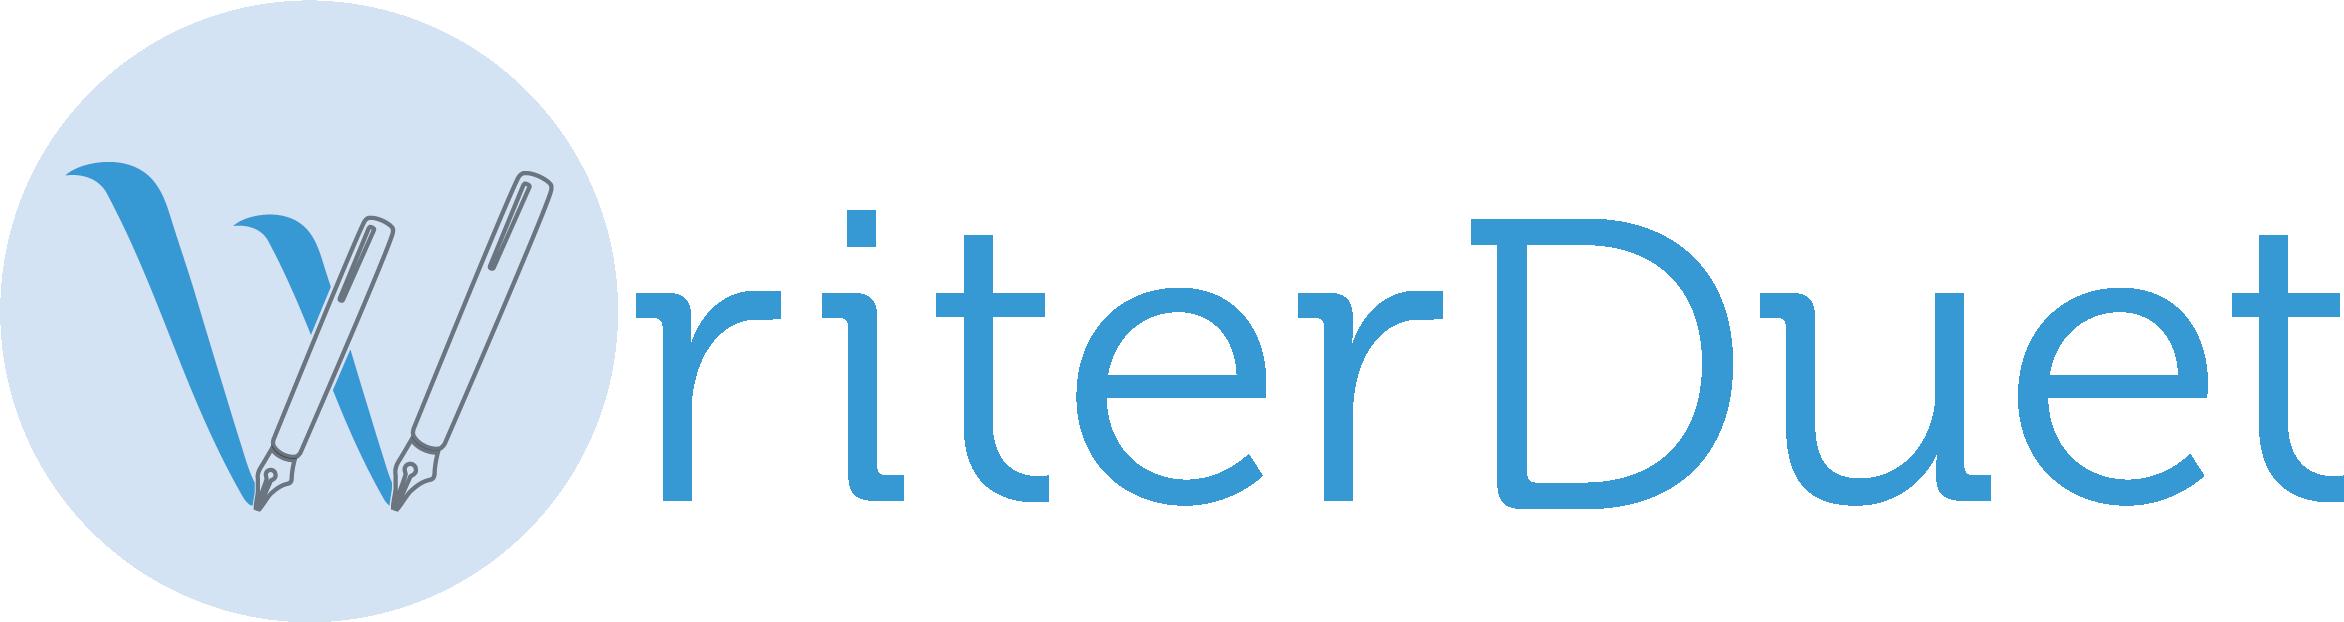 WriterDuet Pro (One Year Subscription) [Online Code]